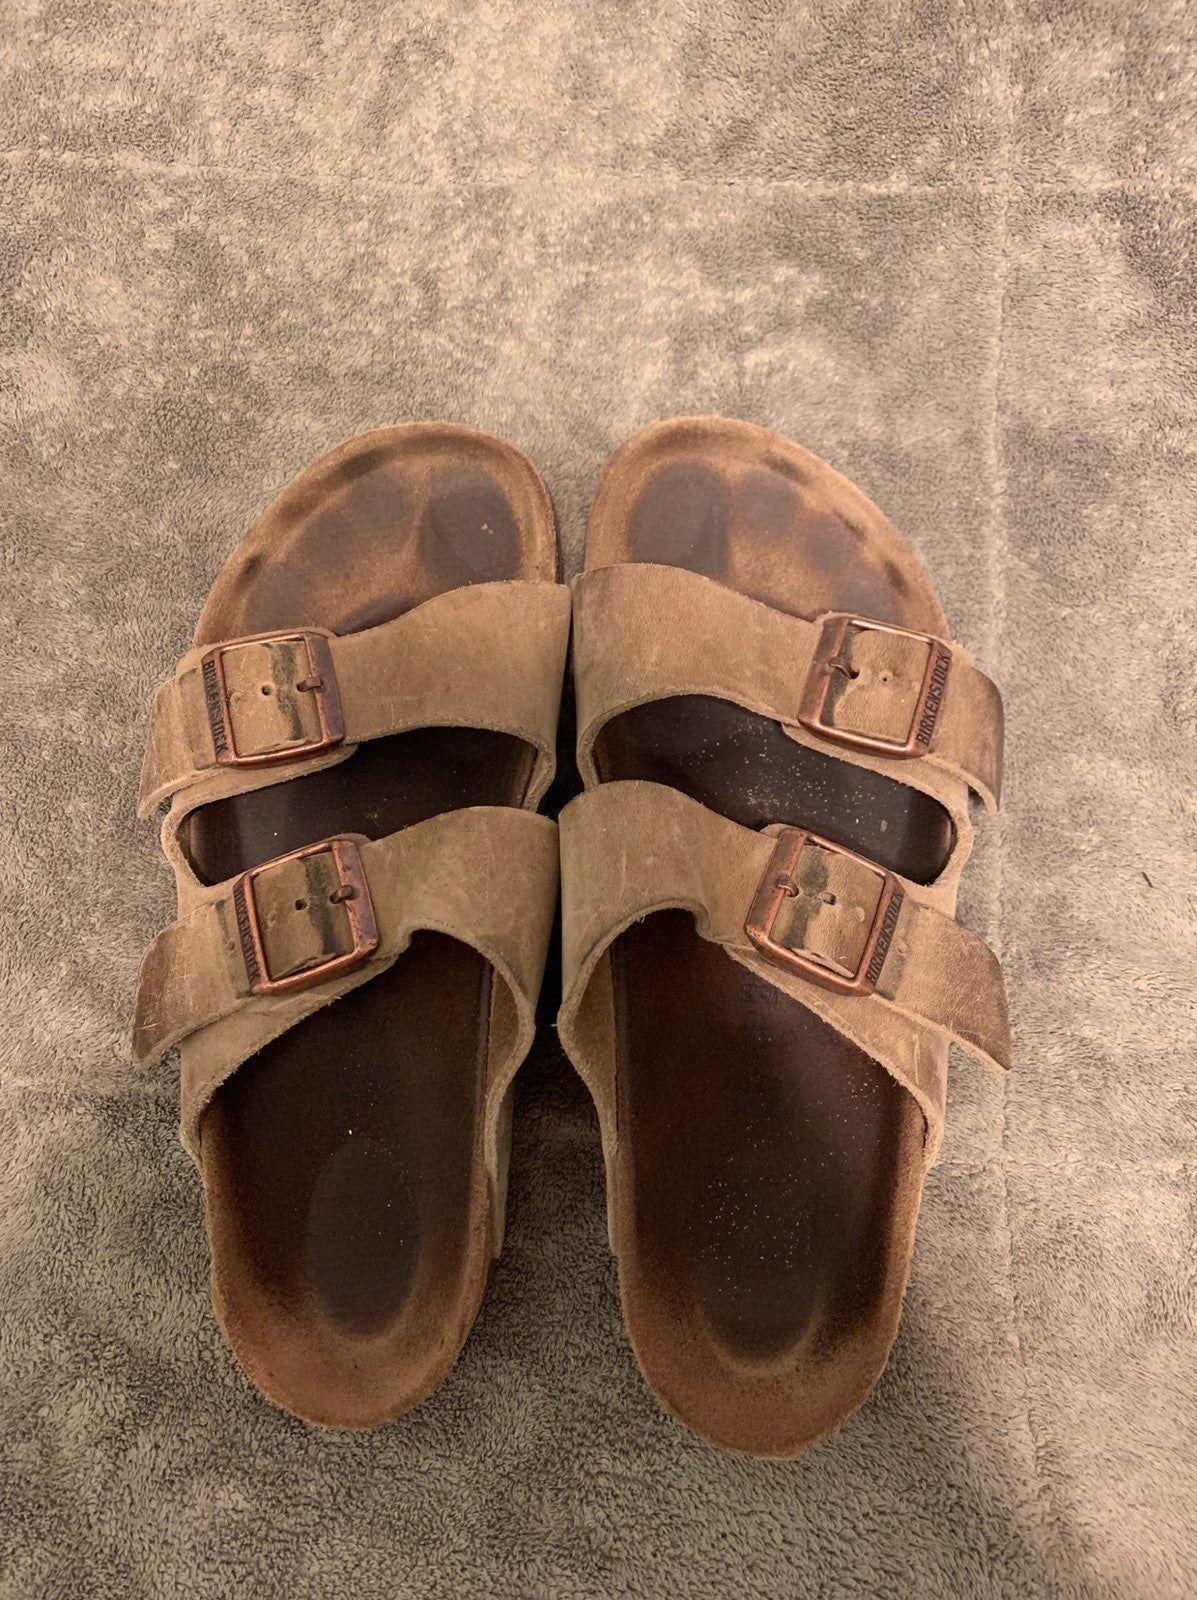 Used Birkenstocks! Picture shows wear